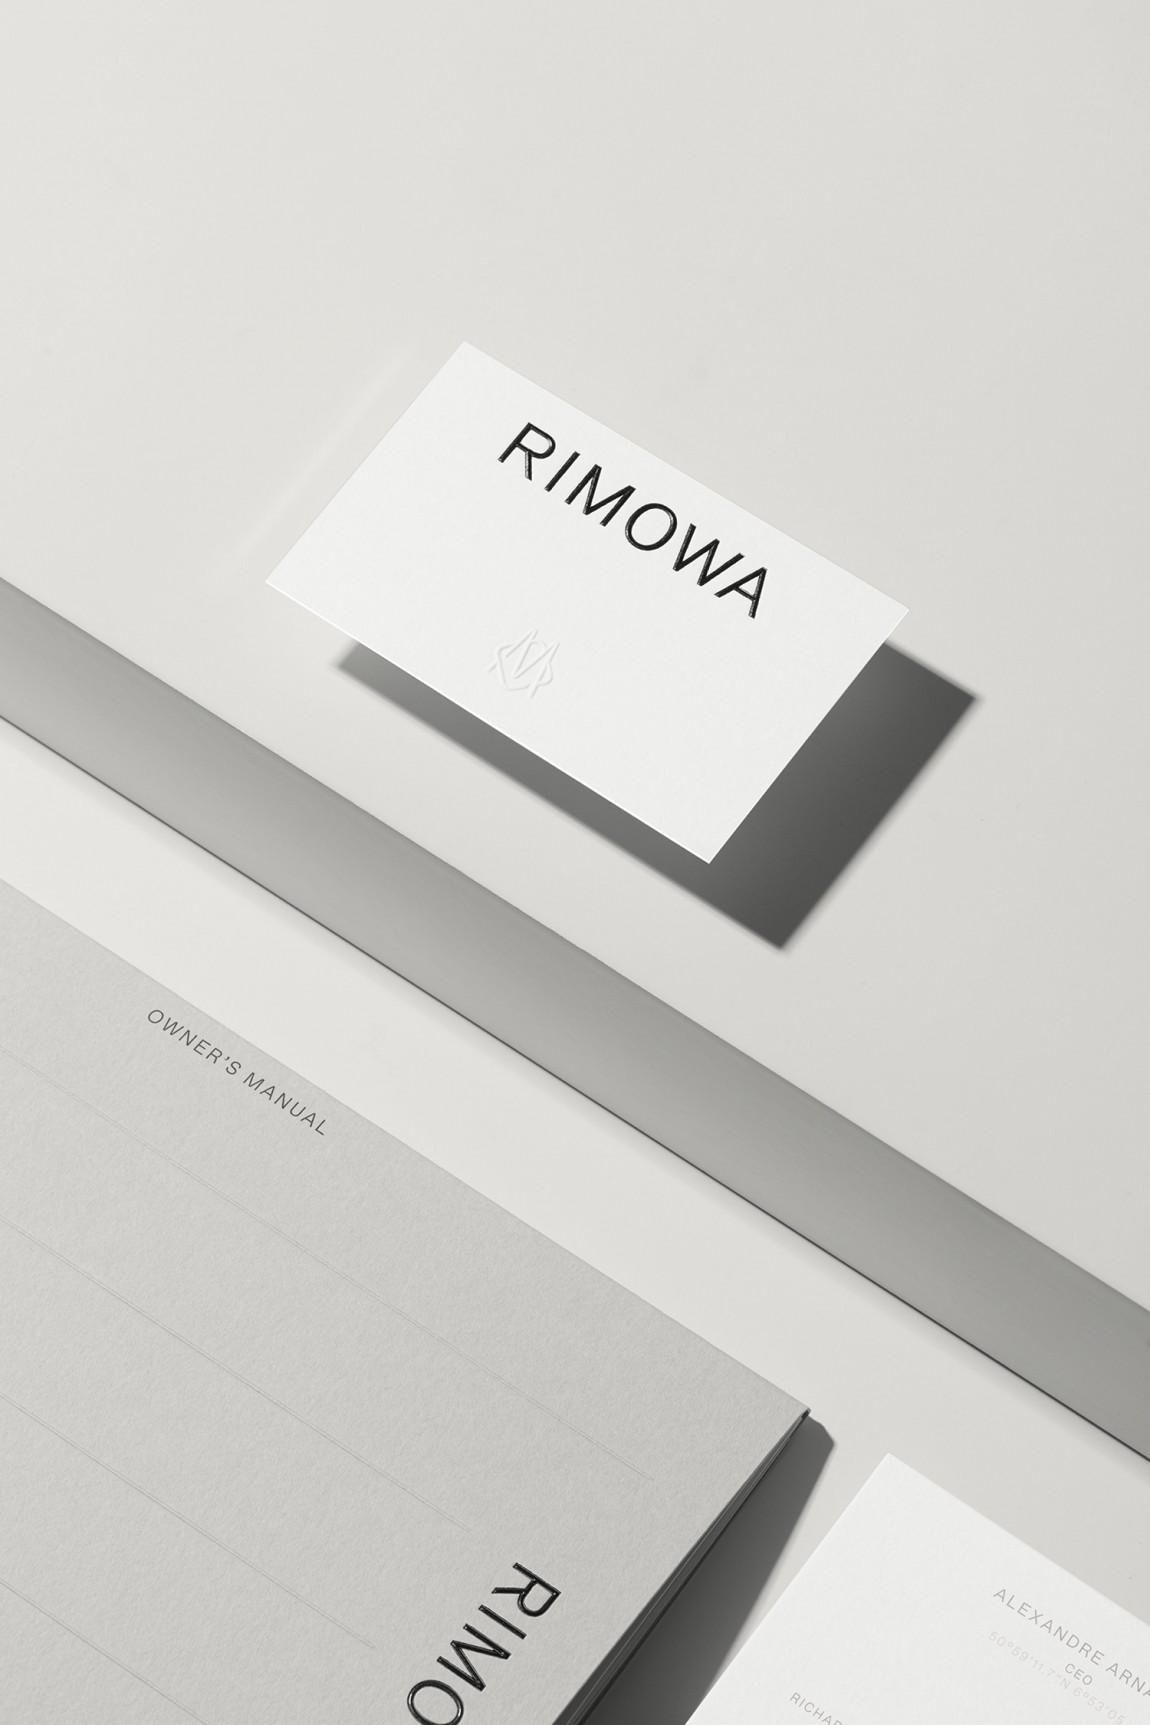 Rimowa豪华箱包国际品牌VI设计,名牌设计